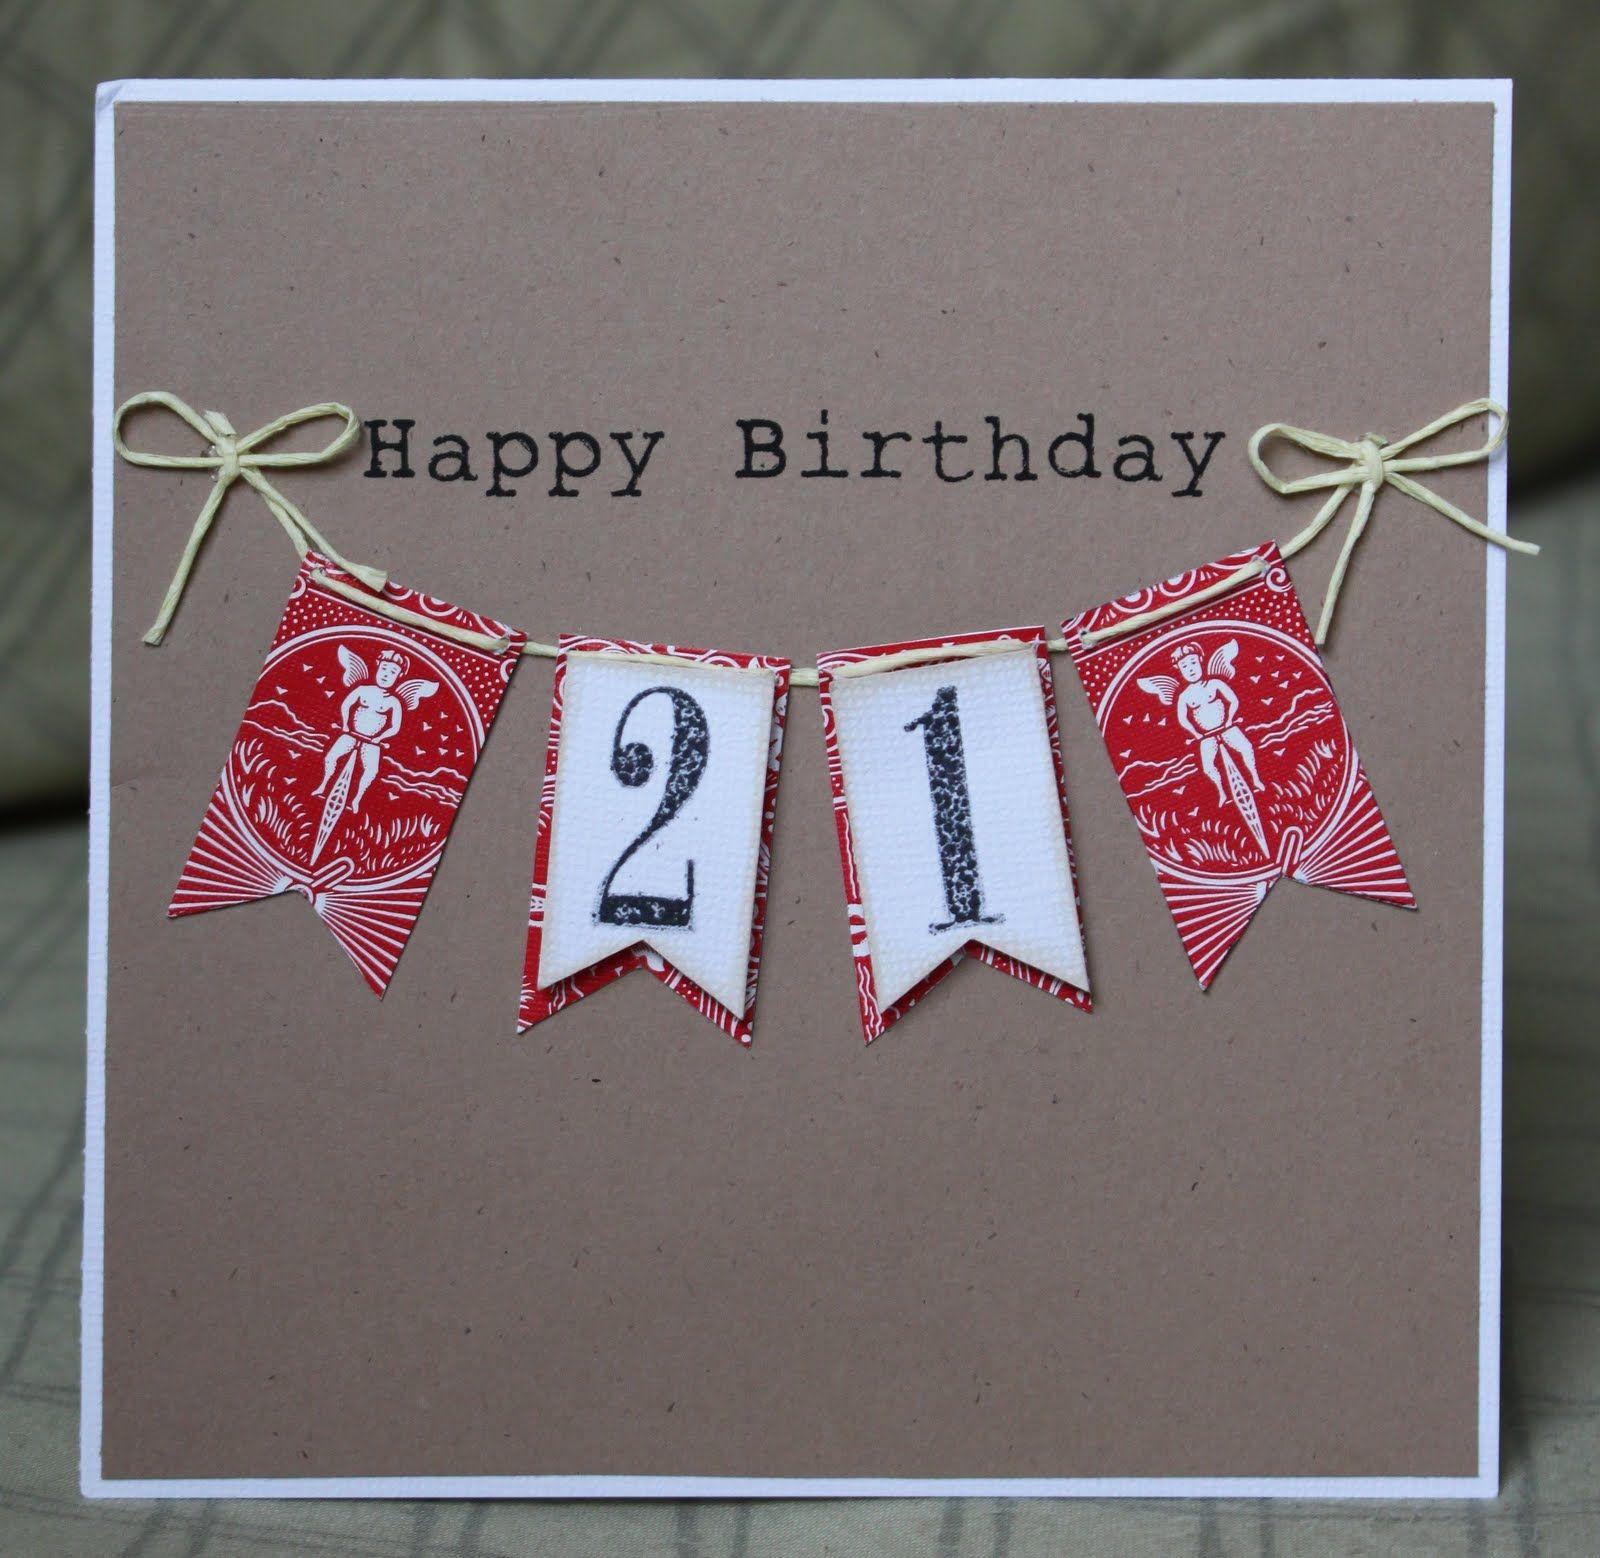 21st Birthday Card By Lalo 21st Birthday Cards Creative Birthday Cards Cards Handmade